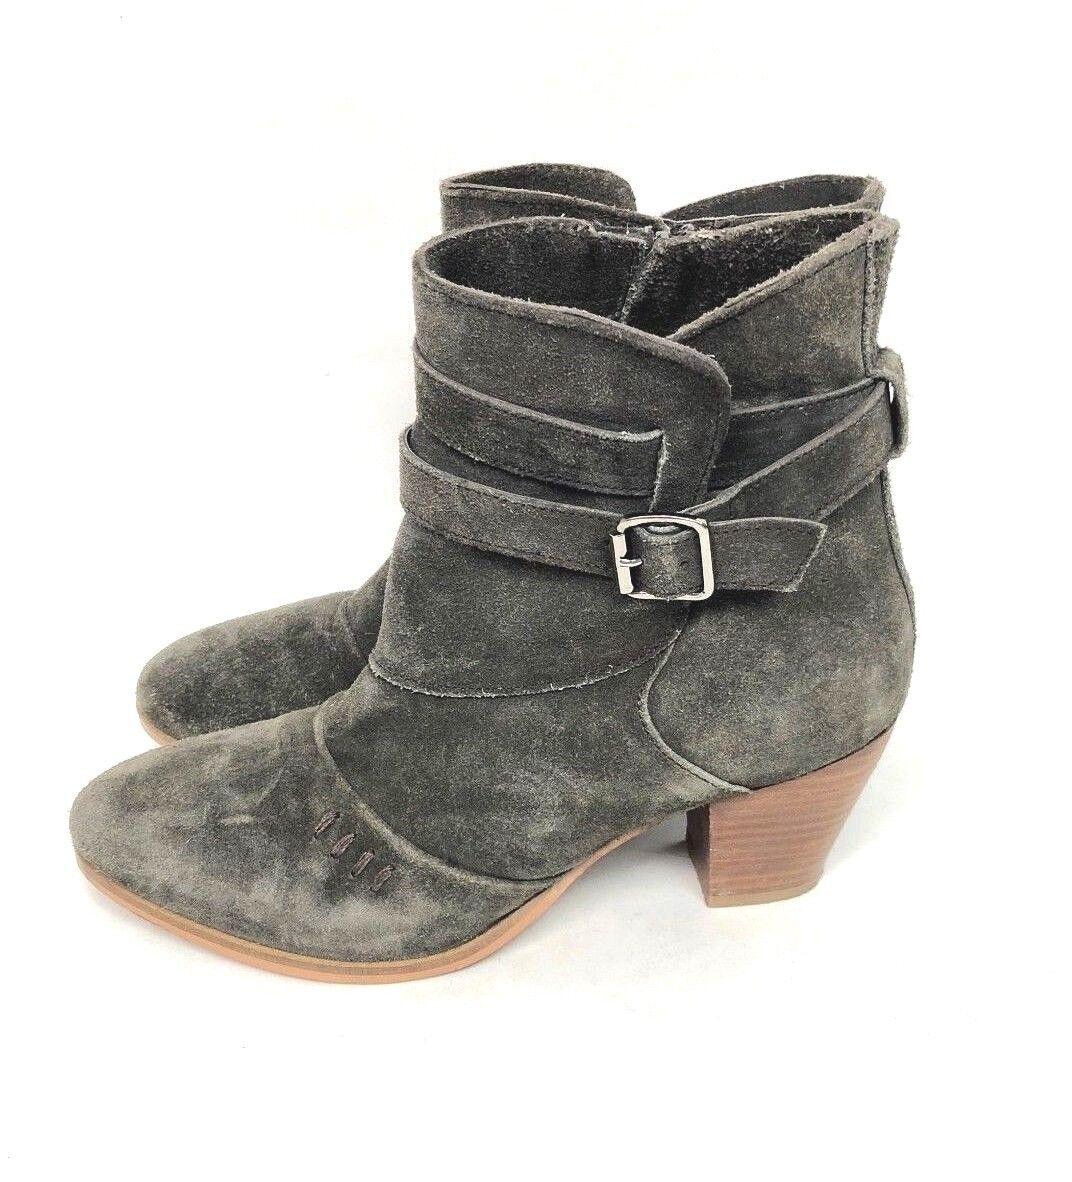 Skechers Womens Ankle Boots  Sz 9 Choc Brown Side Zip Side Buckle Suede